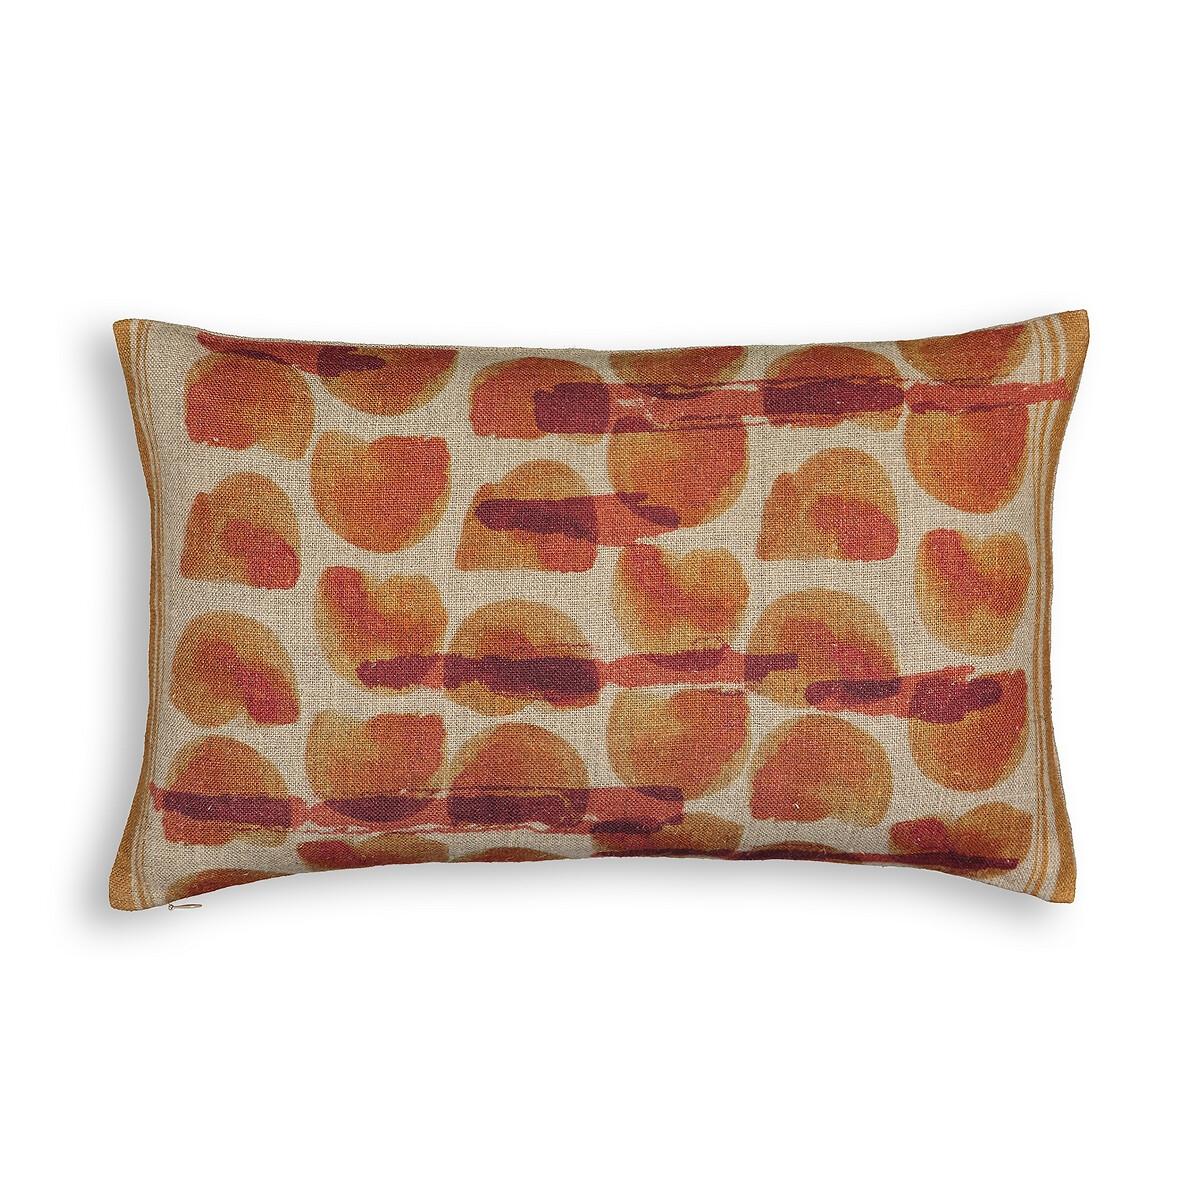 Чехол LaRedoute На подушку 100 лен Limona 50 x 30 см оранжевый 0 pr на 100